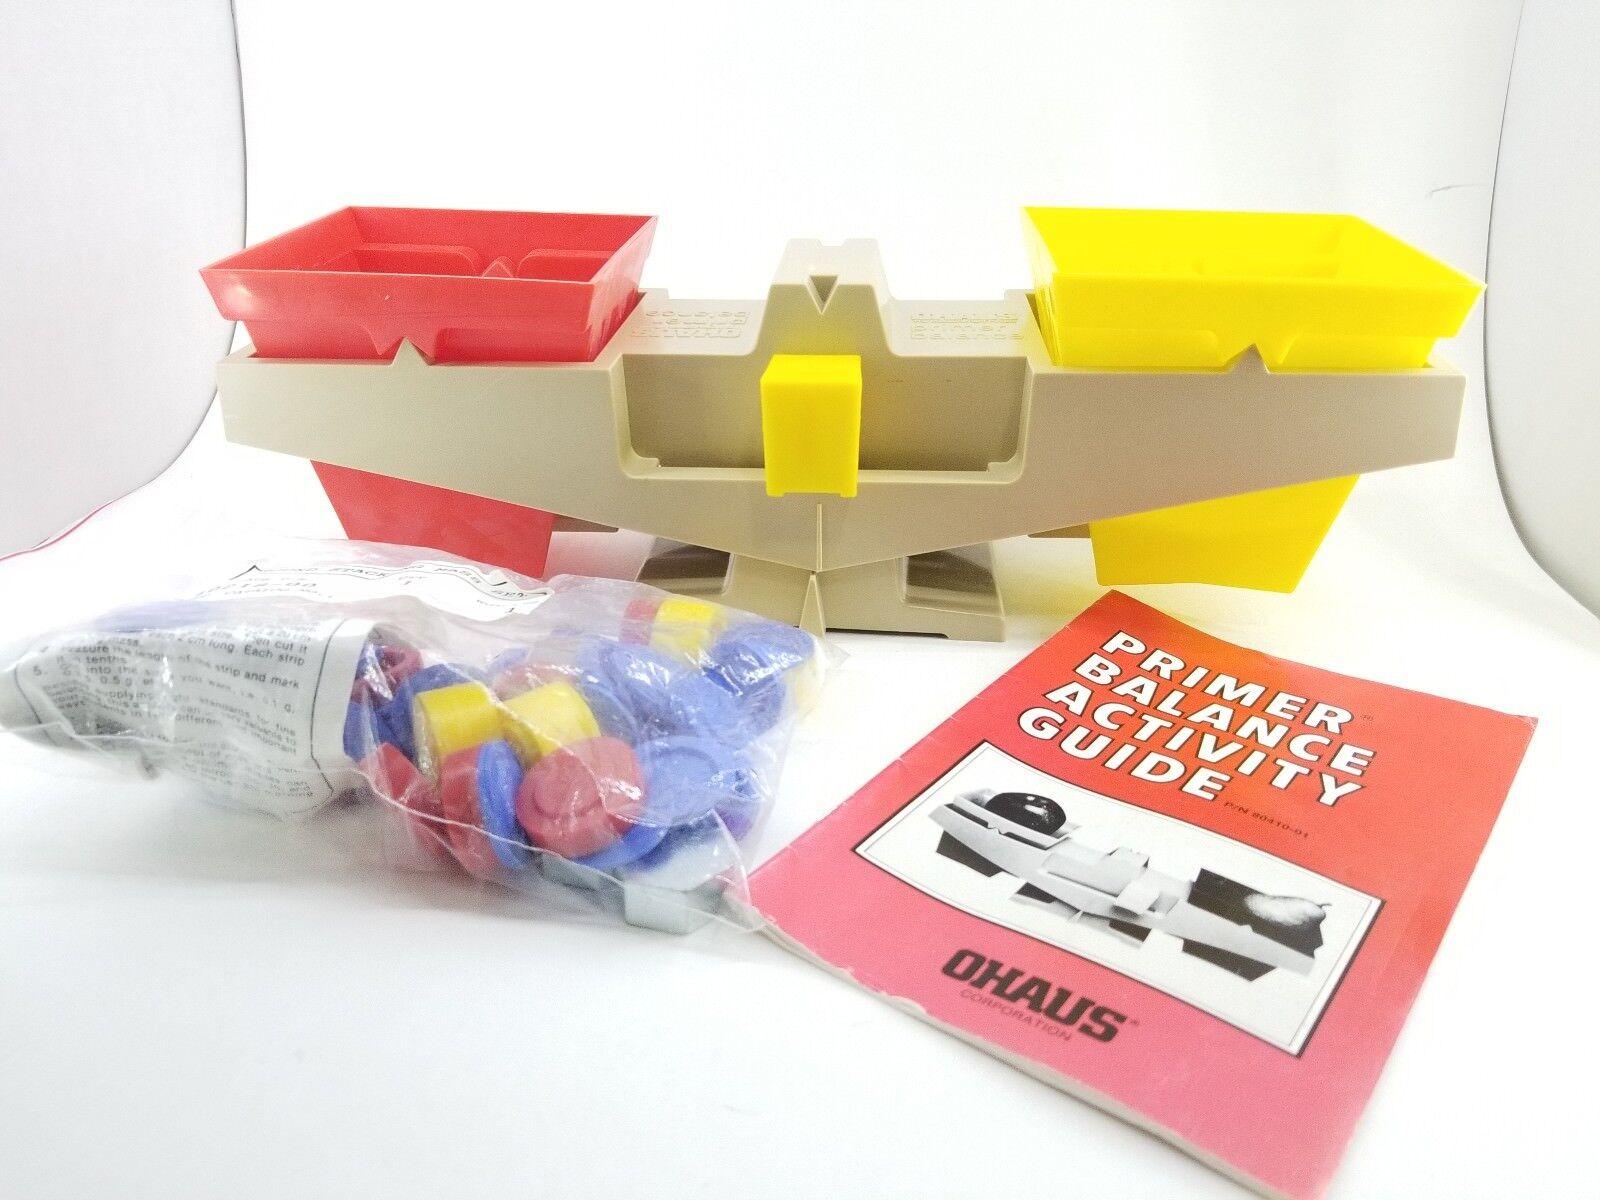 Ohaus primer balanza 1976 Edu Aprender Juguete Actividad aula visual nuevo viejo stock Caja